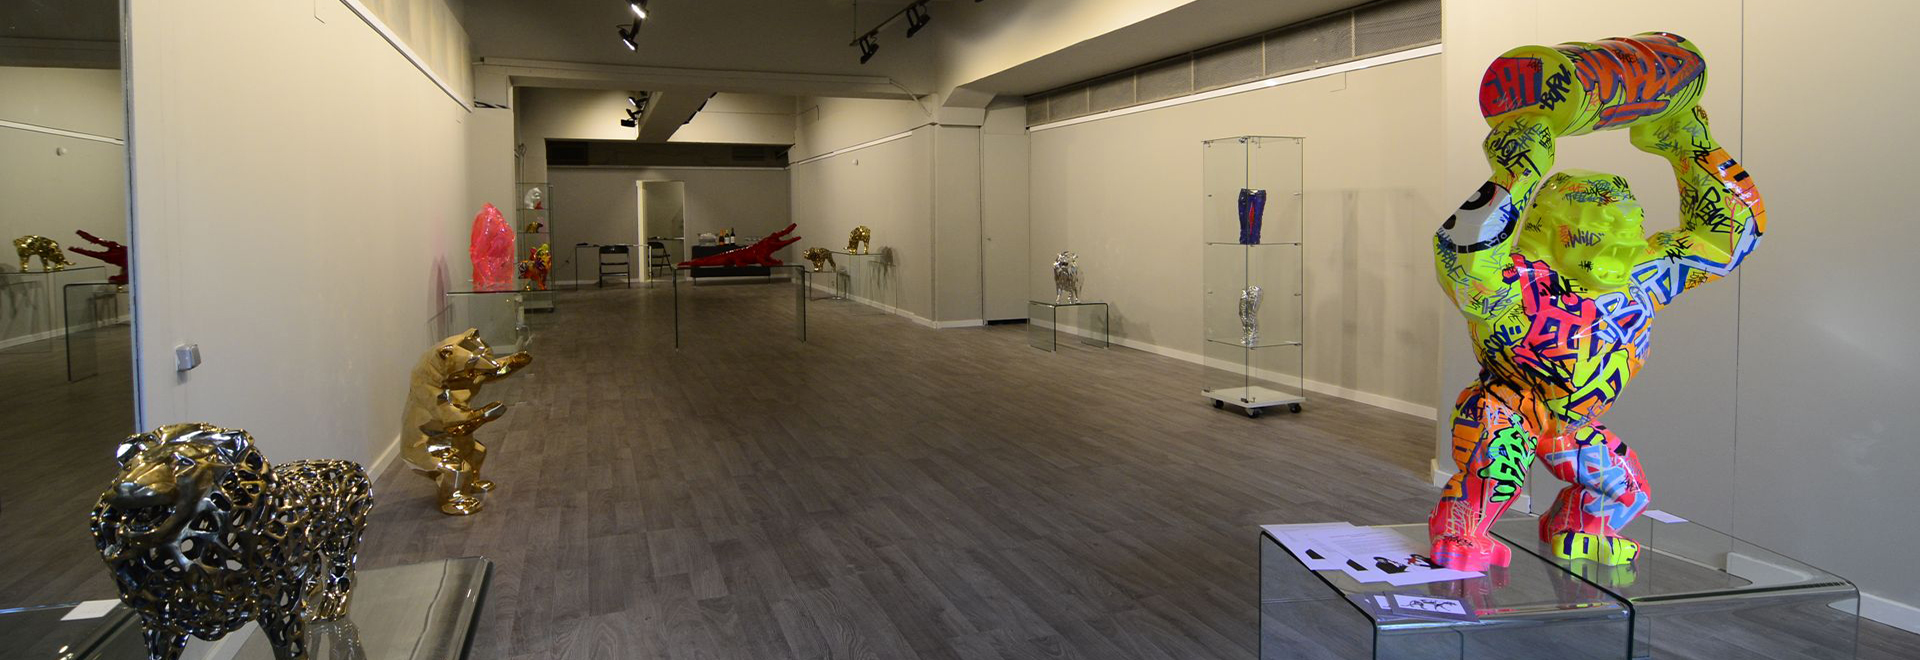 fauchery-gallery-2